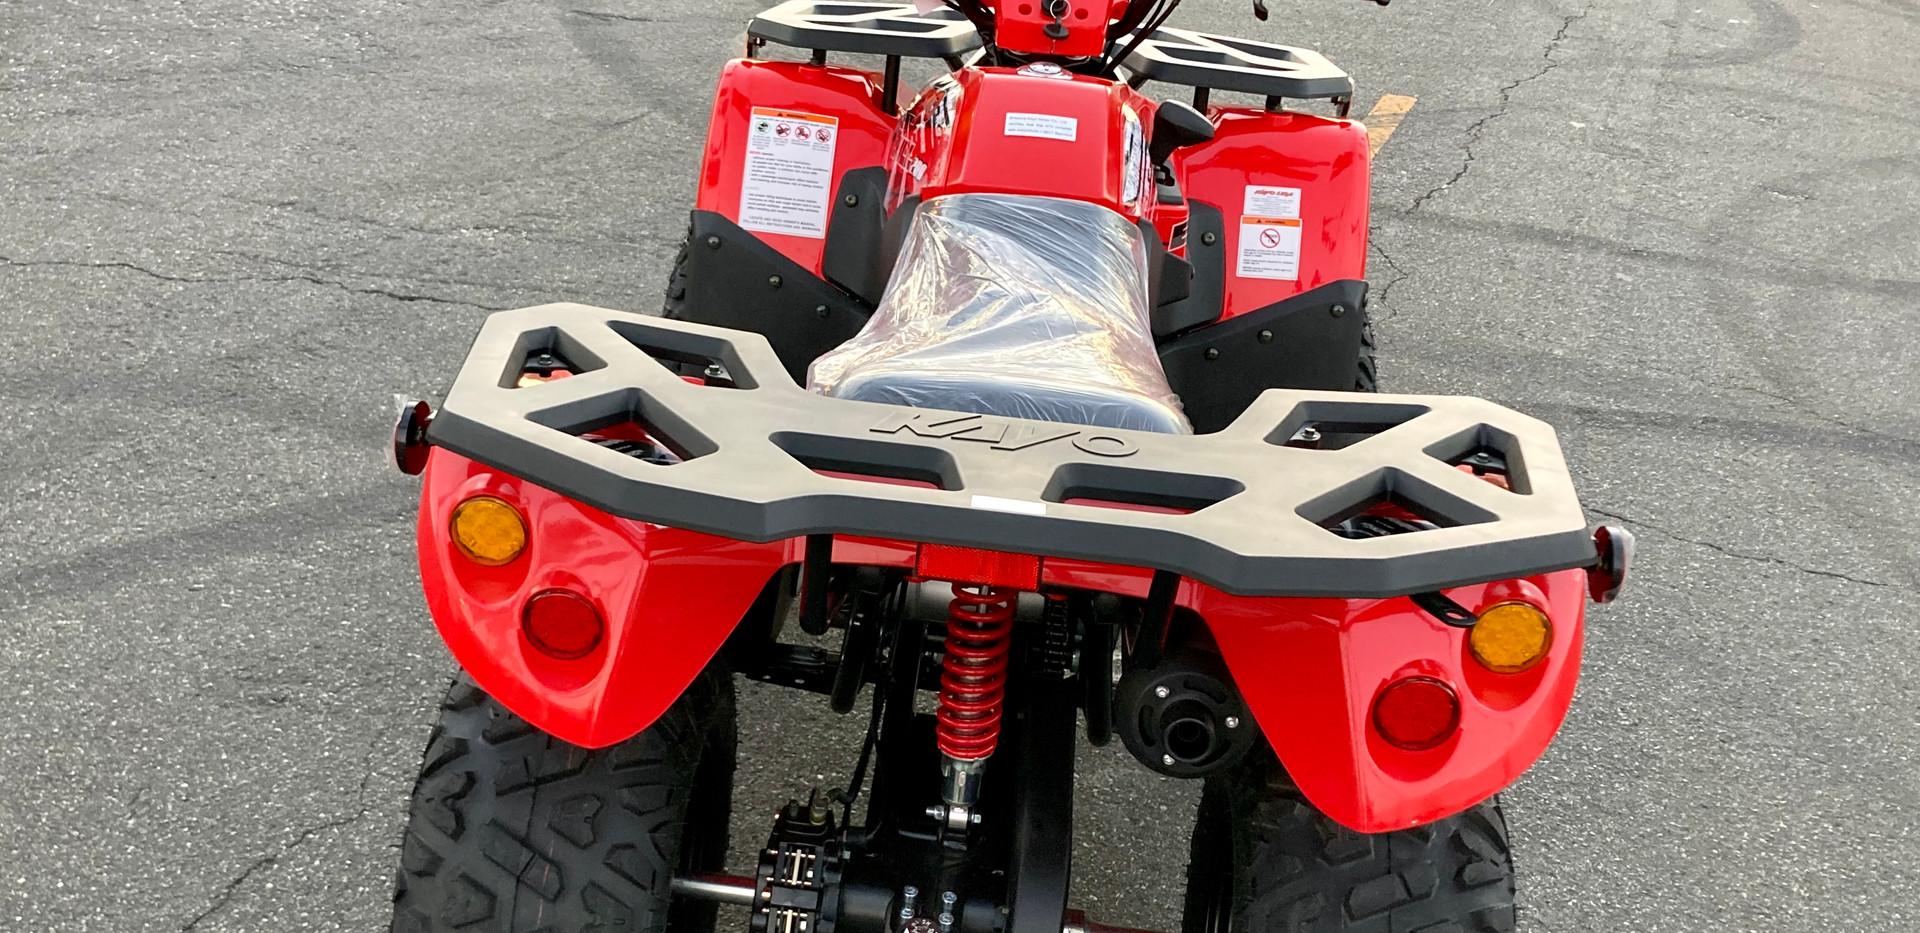 2020 Kayo Bull 200 (Red) (17).JPG